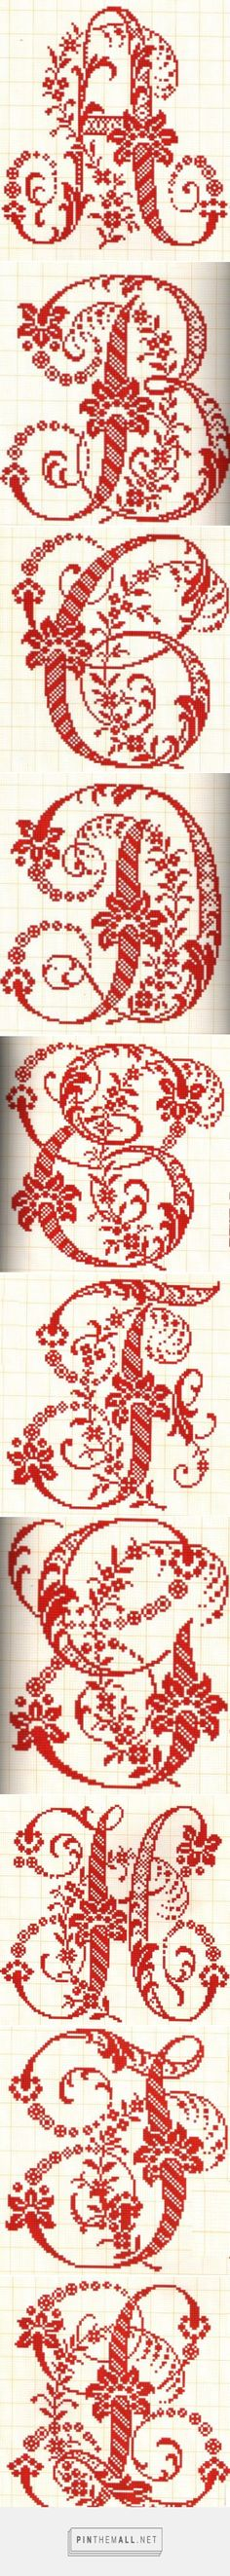 Rabarbarum: Alfabeto 1^ parte - created via http://pinthemall.net